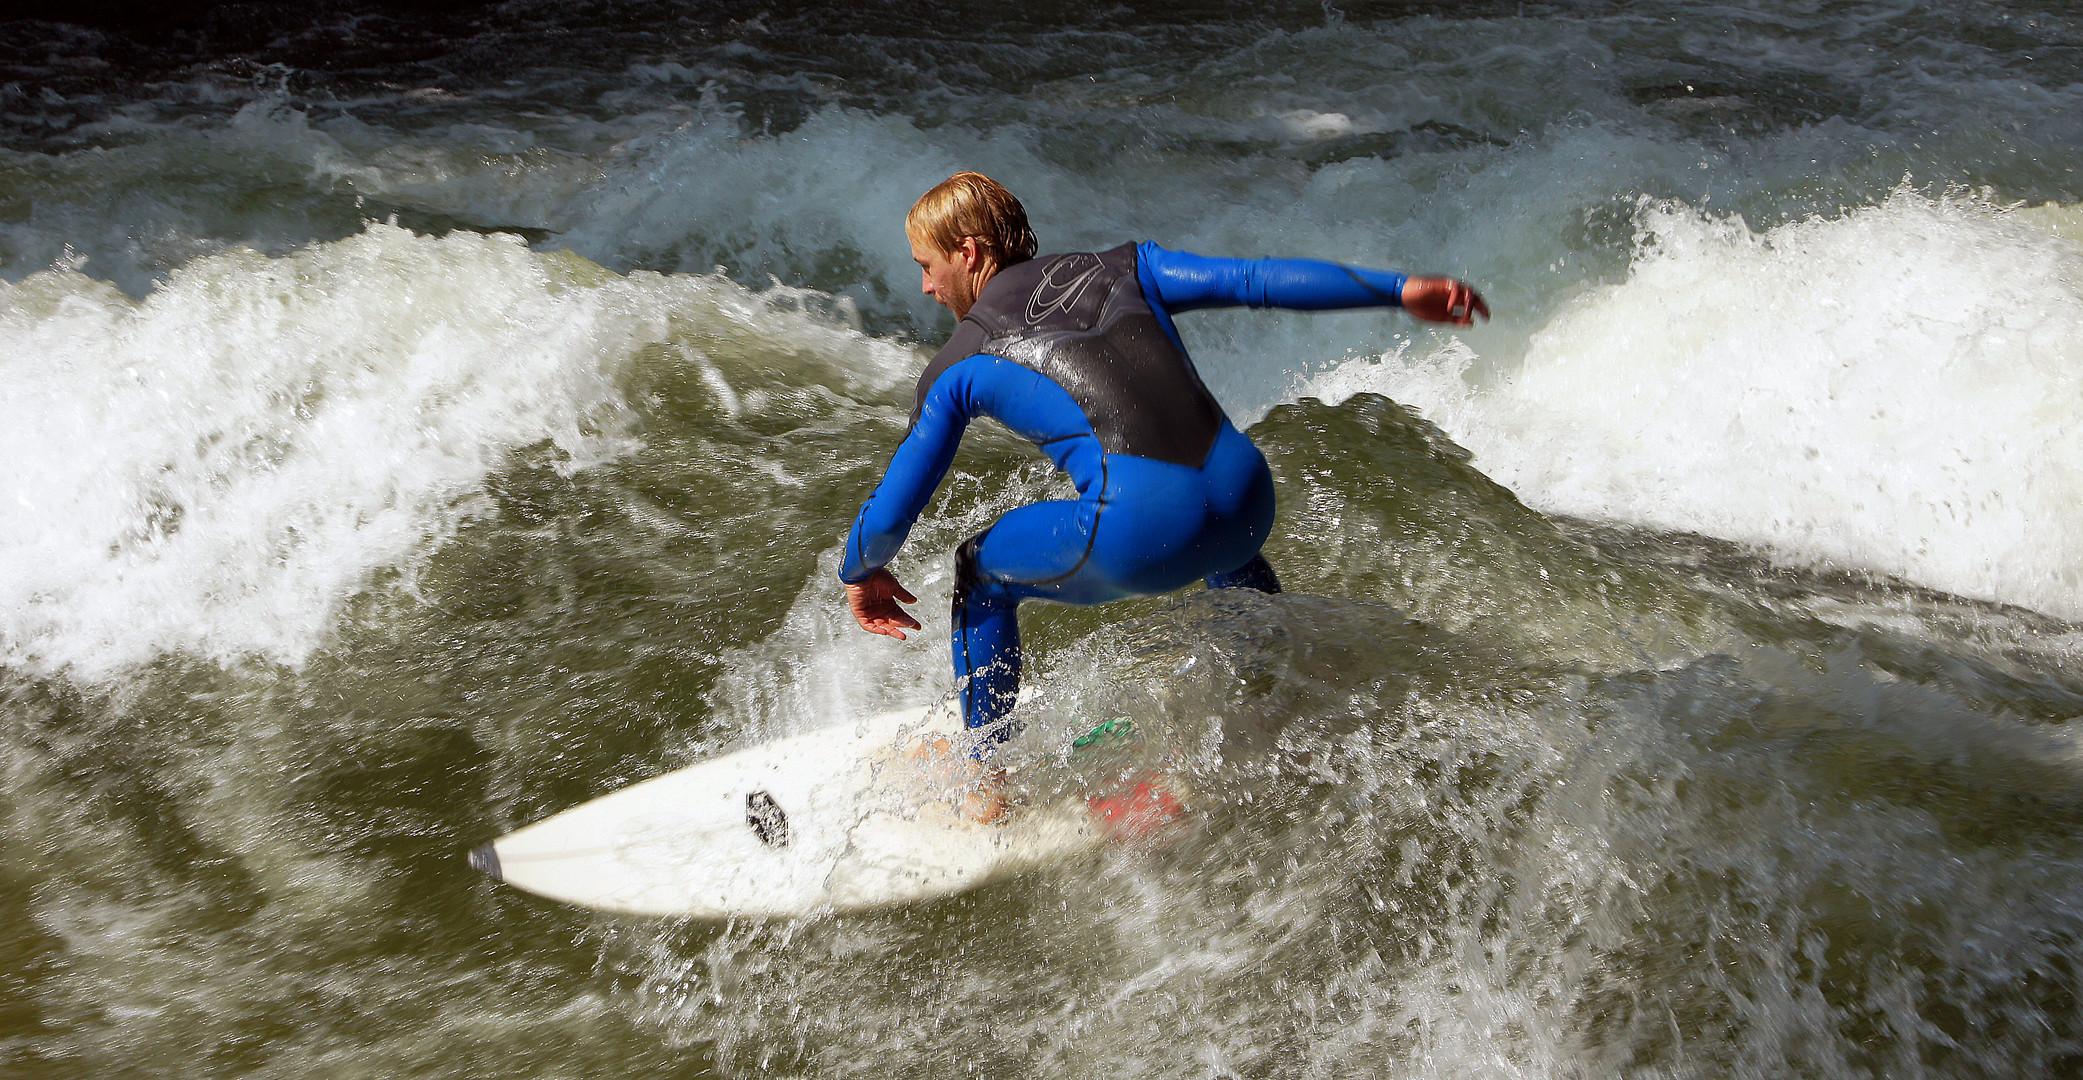 - - - Keep Surfing - - -